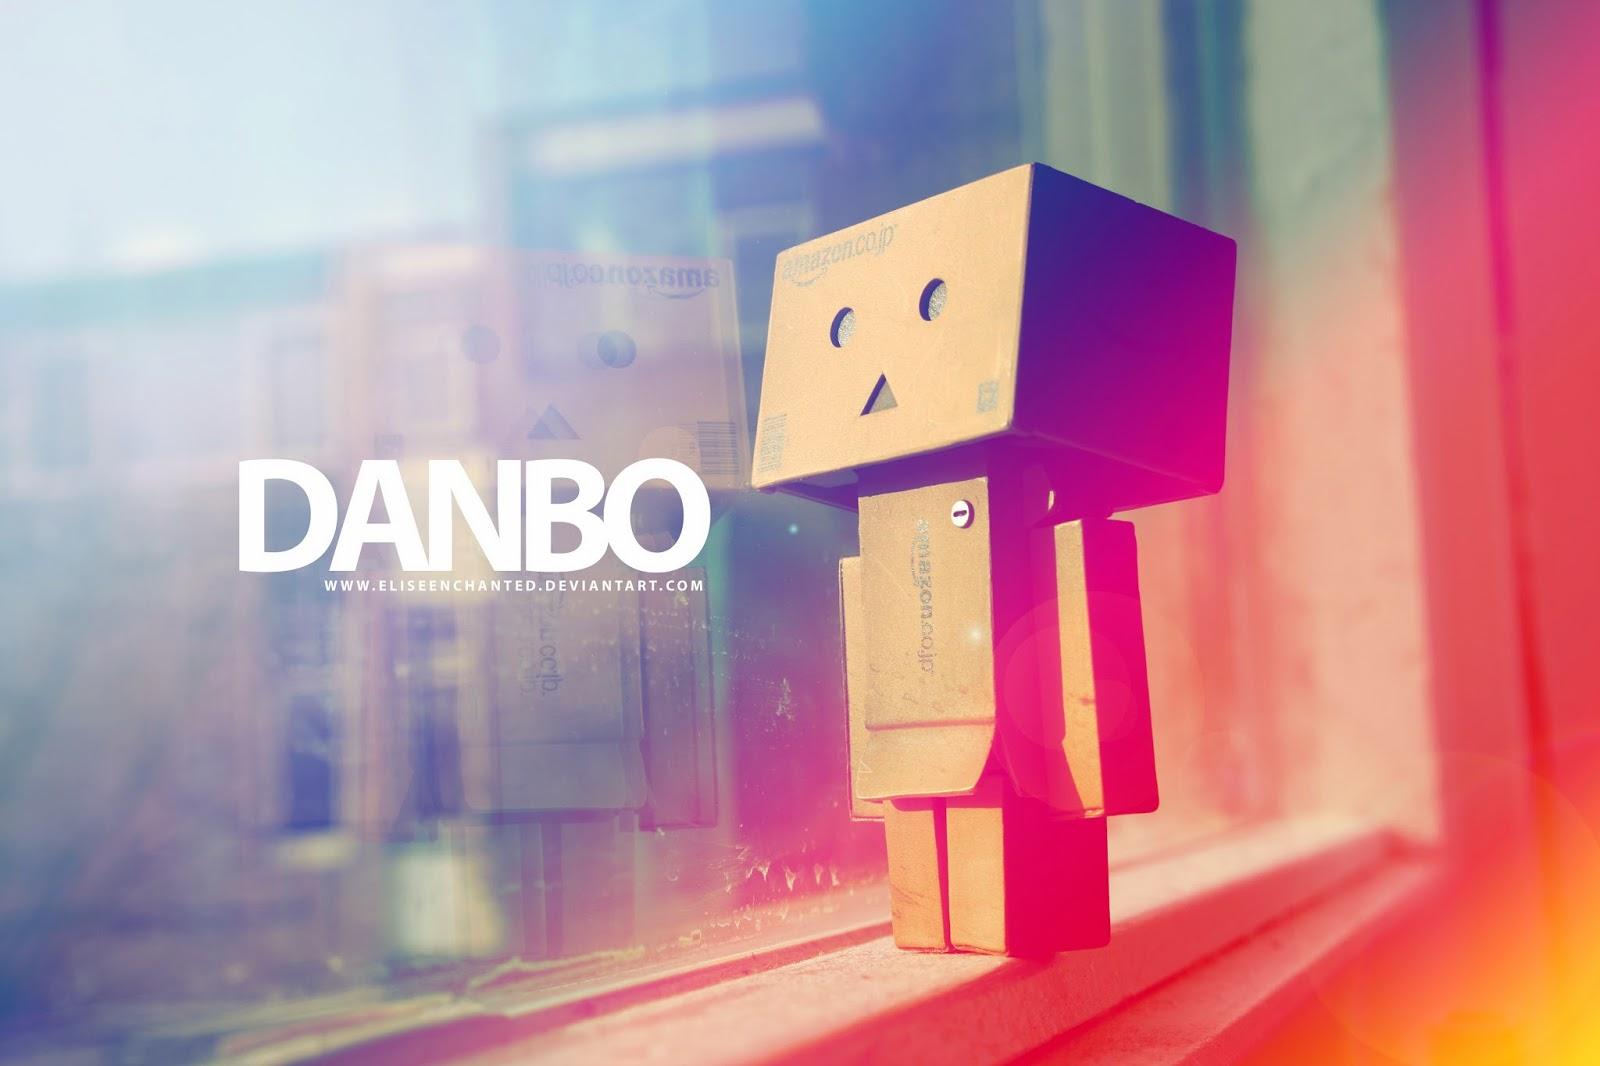 Danbo Wallpapers – Cute, Adorable & Lovely Danbo Art